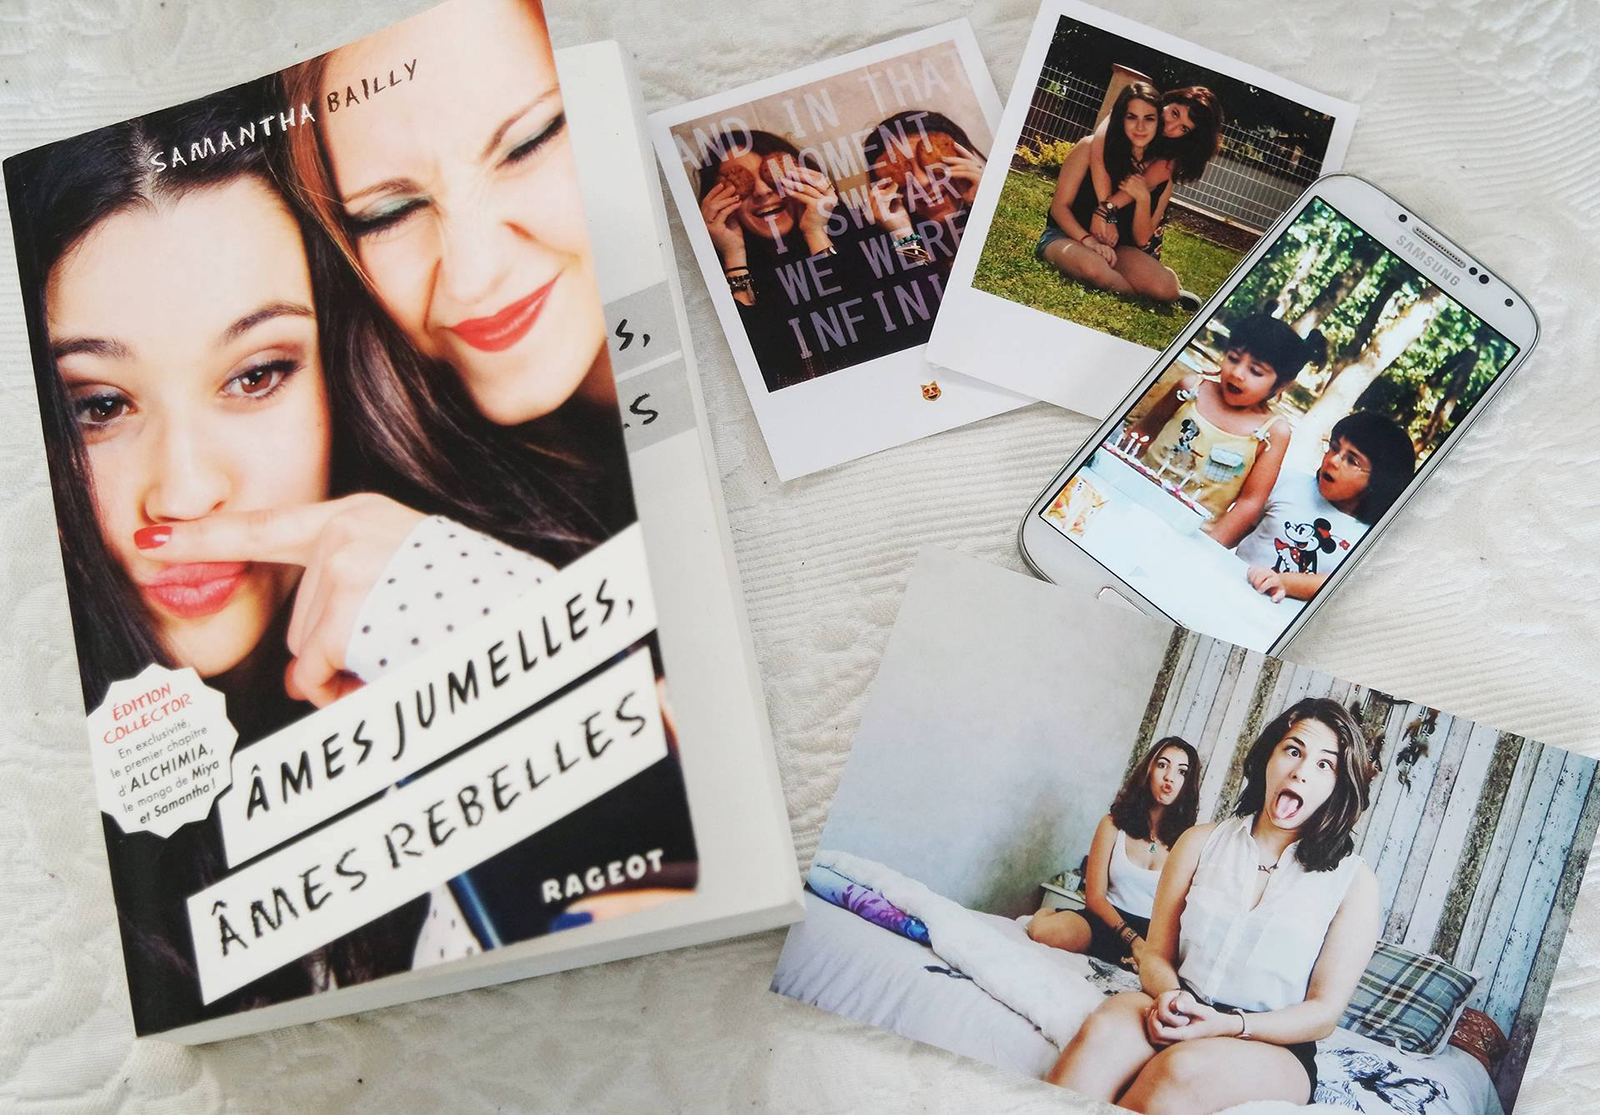 Ames jumelles ames rebelle Samantha Bailly Coin des licornes avis livre